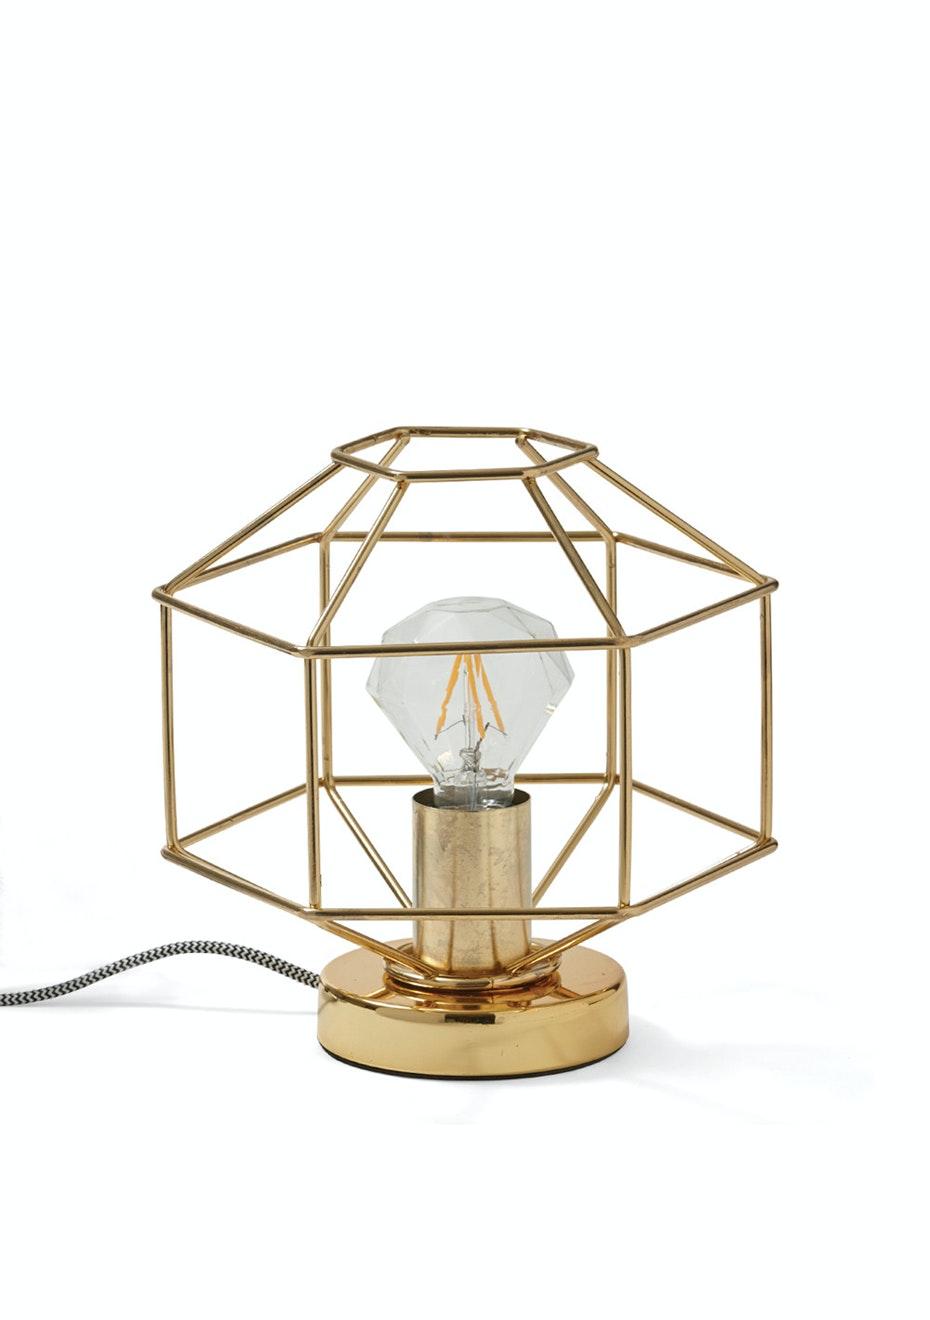 Me & My Trend - Gold Diamond Lamp